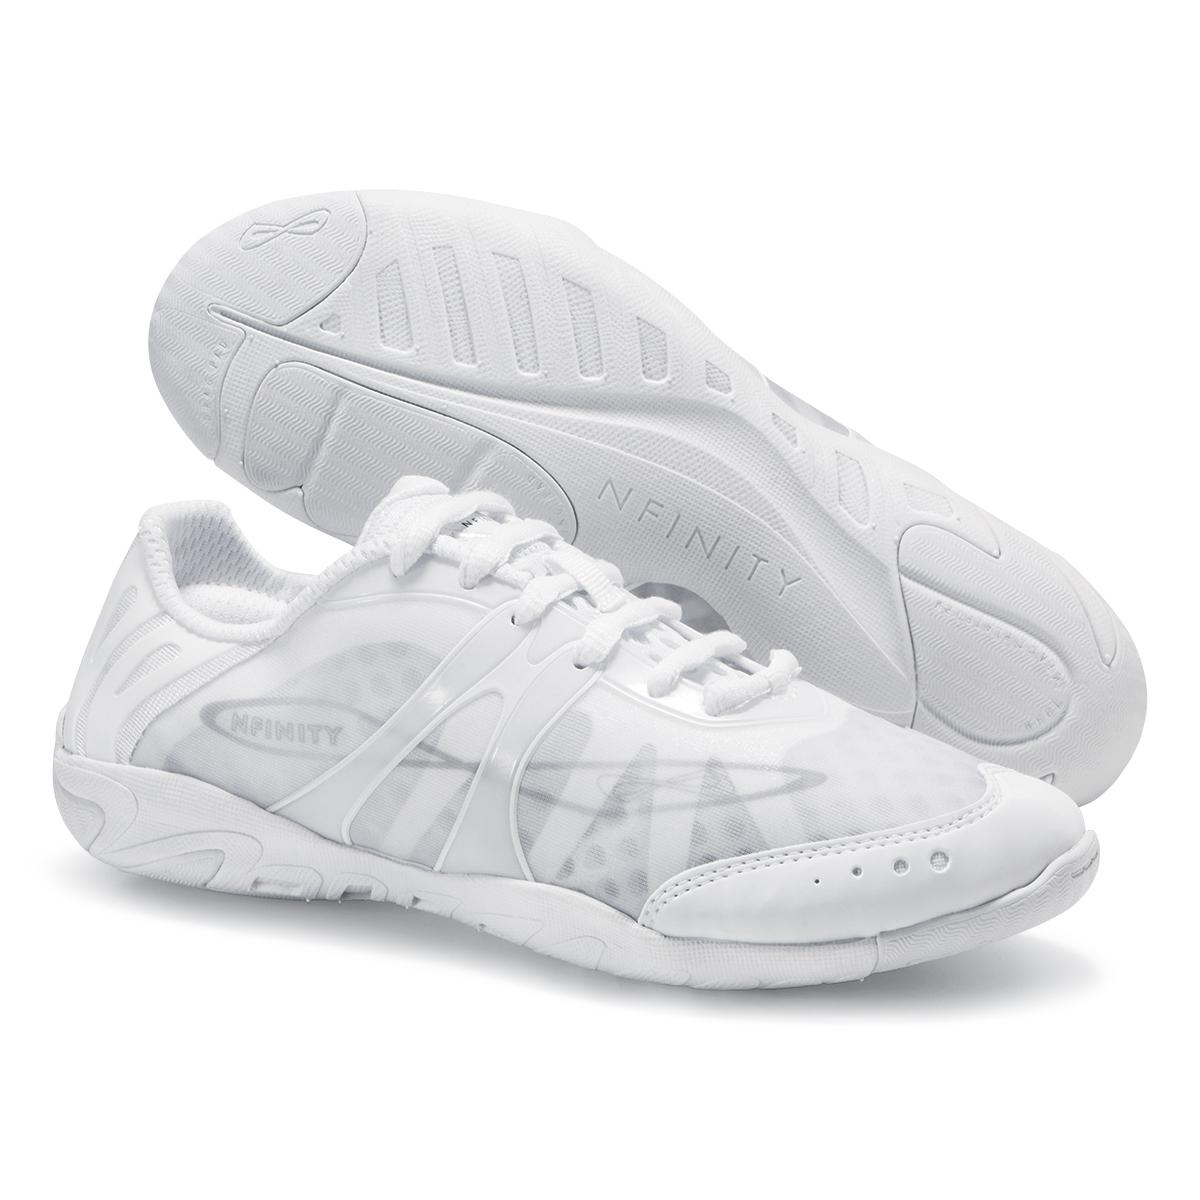 cf8aacc36e61 Nfinity Vengeance Cheer Shoe | High-quality cheerleading uniforms ...